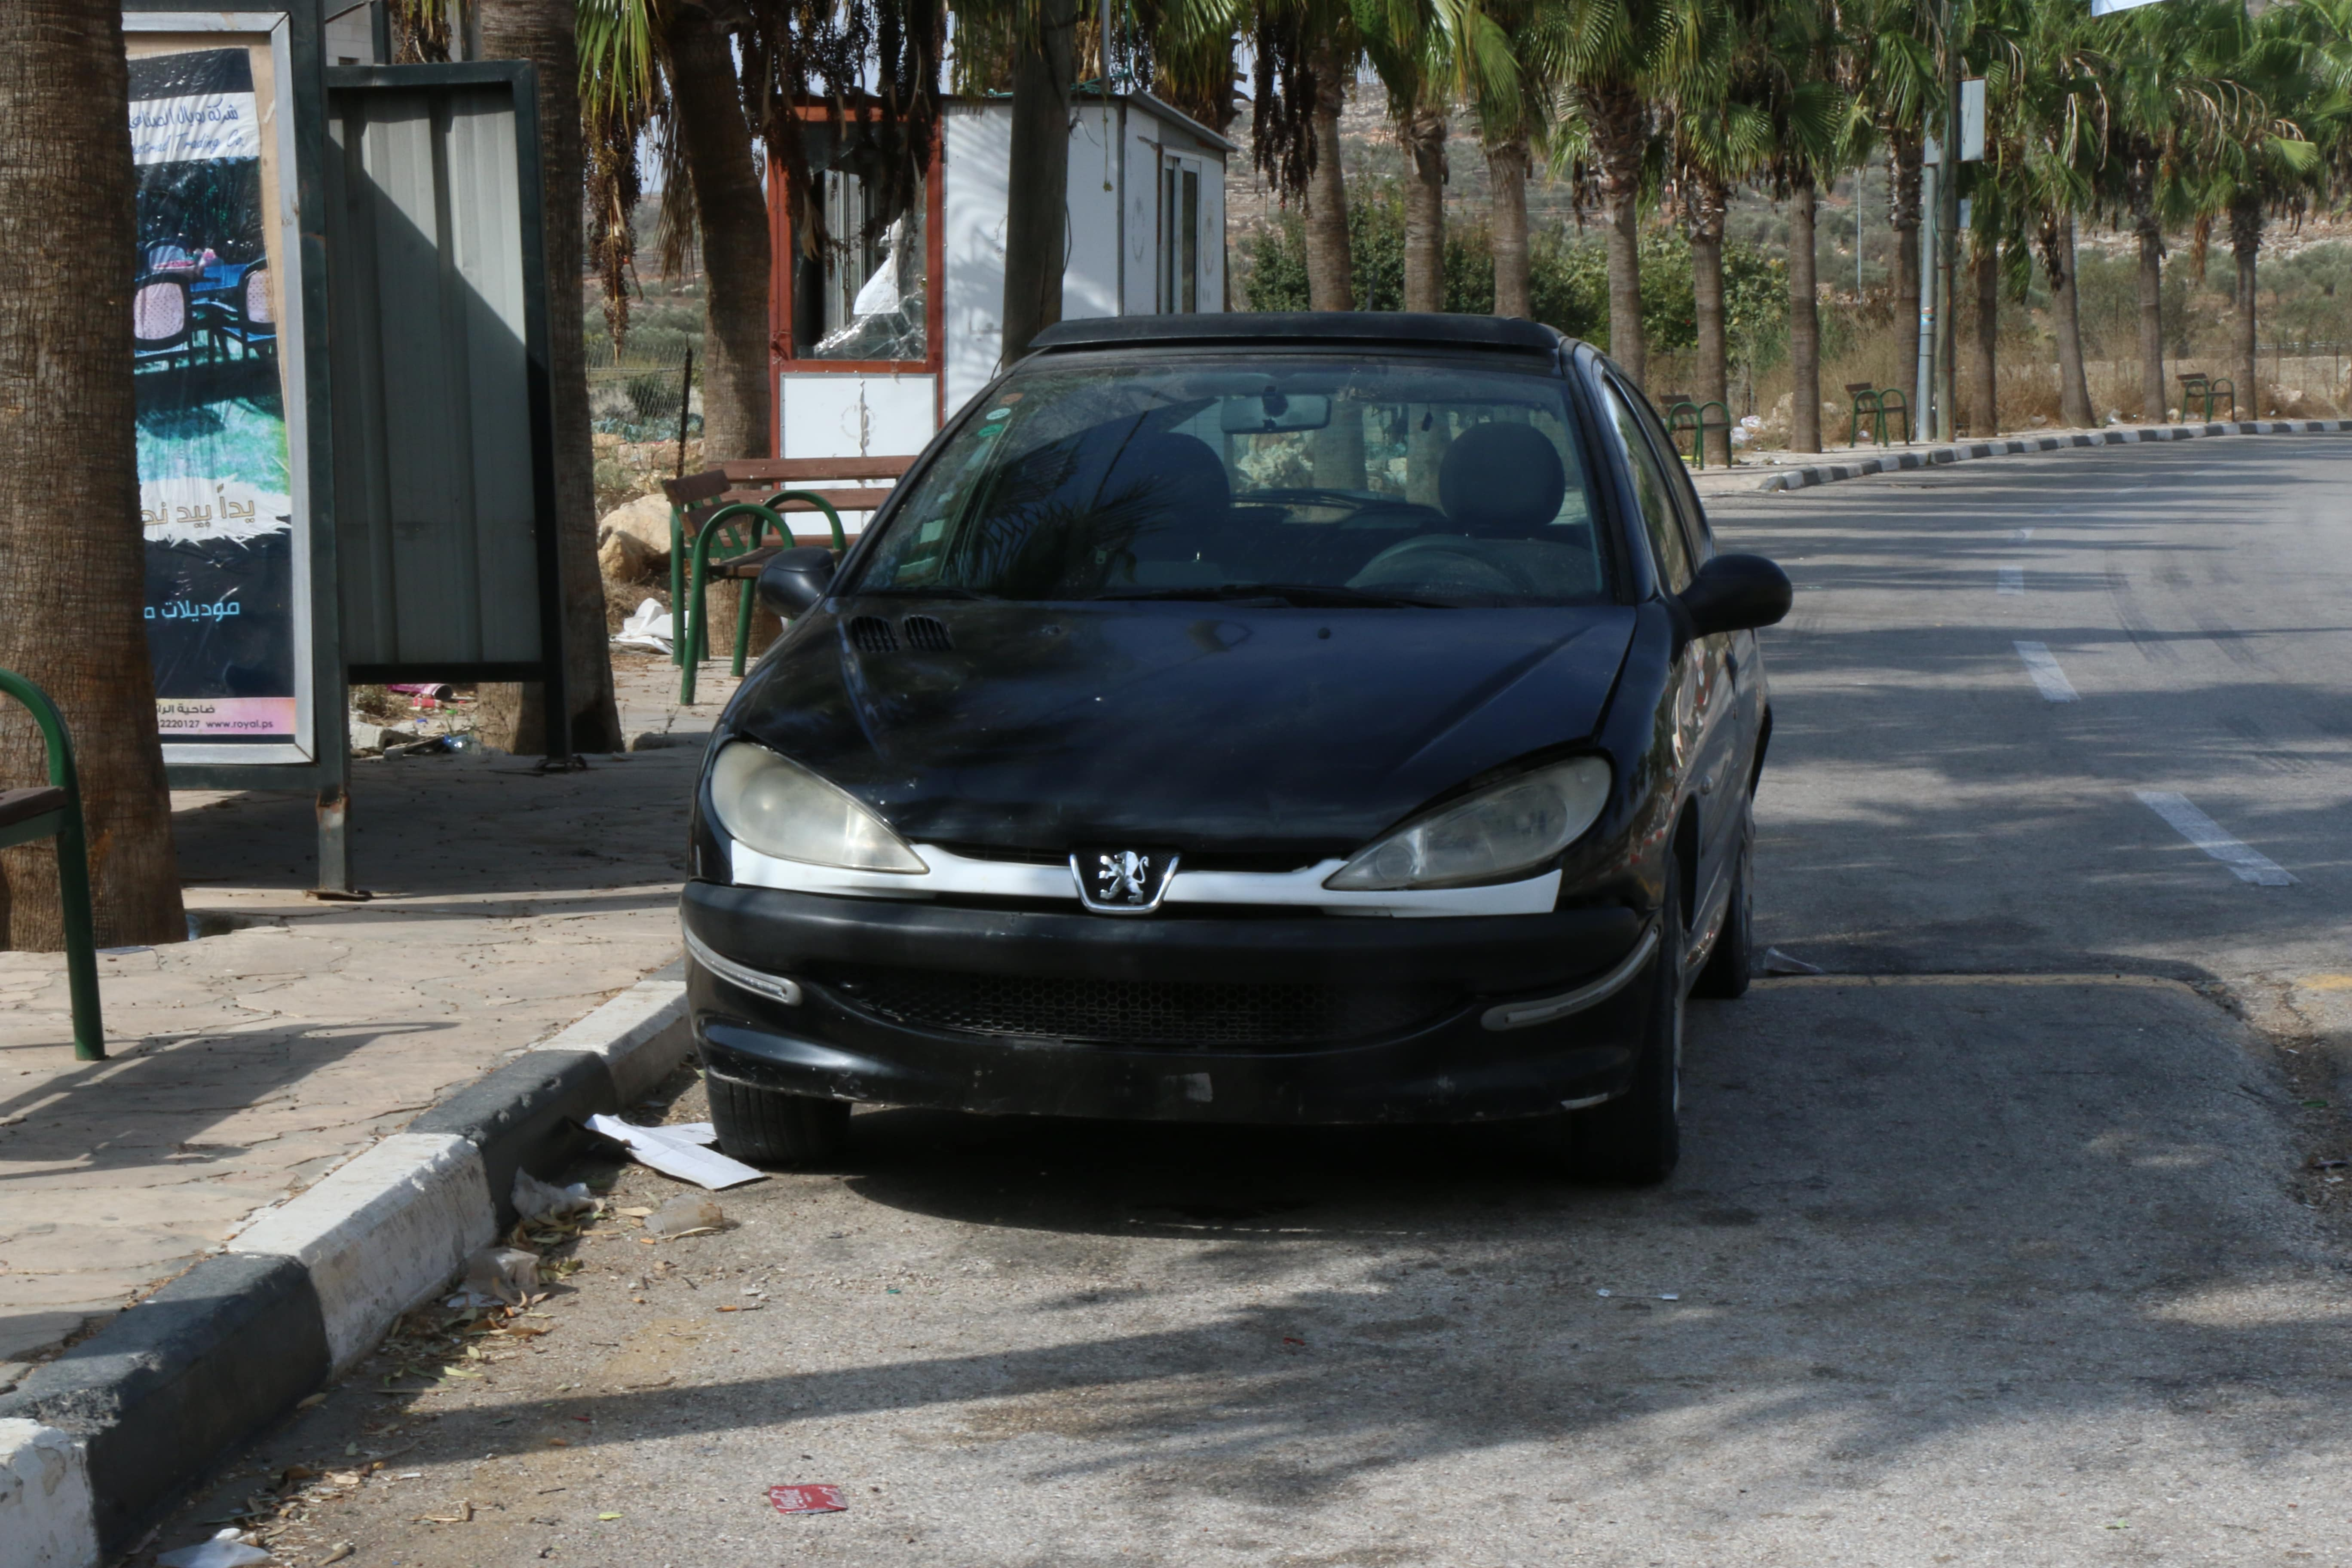 SOnbar's car